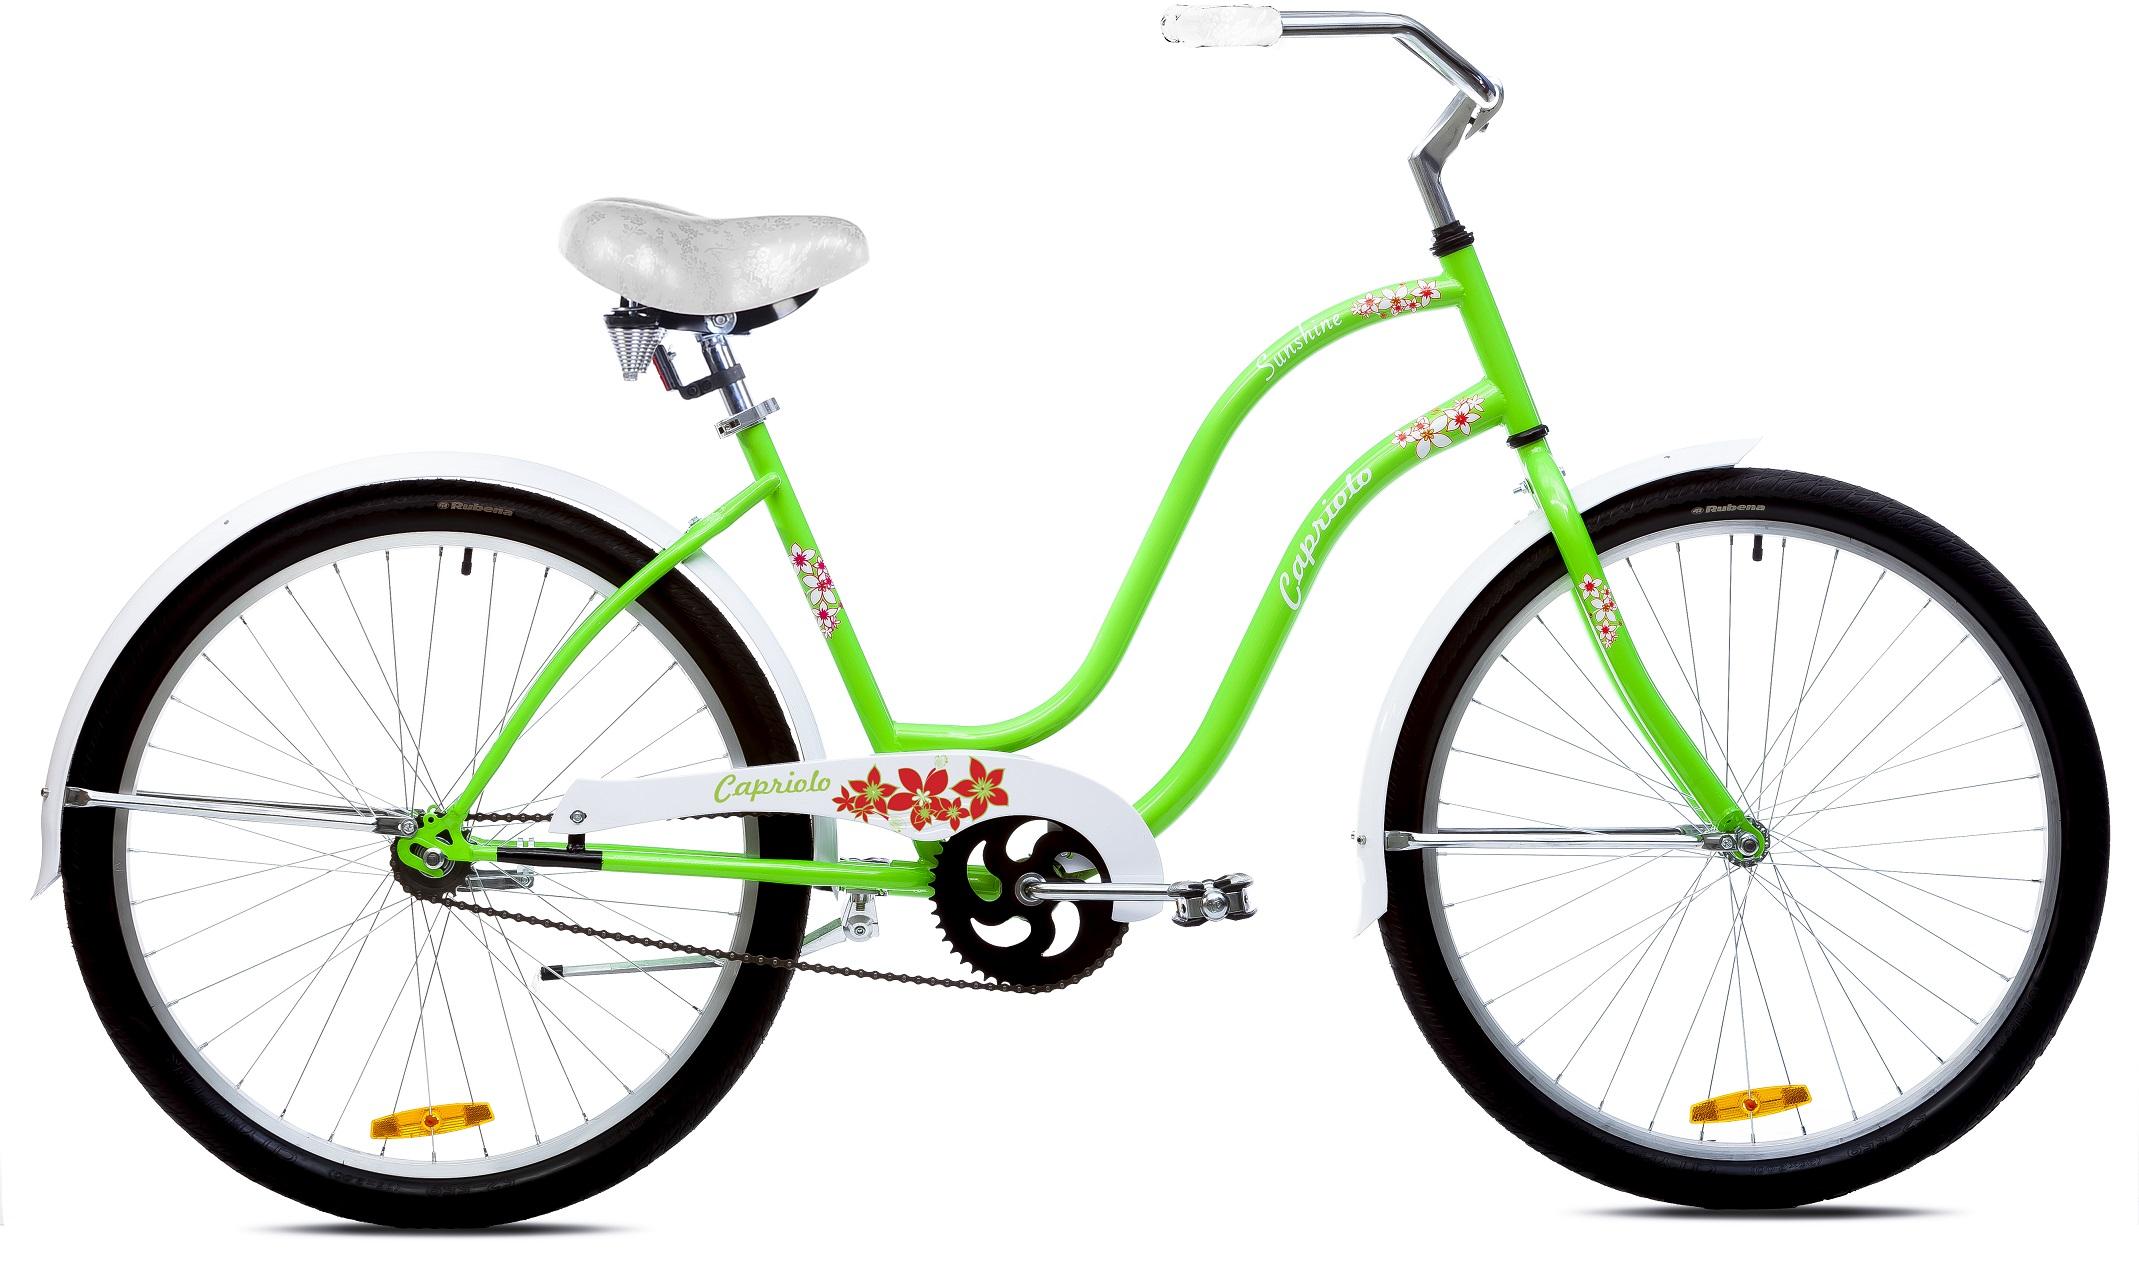 bicikl-capriolo-sunshine-26-zeleno-belo-crvena